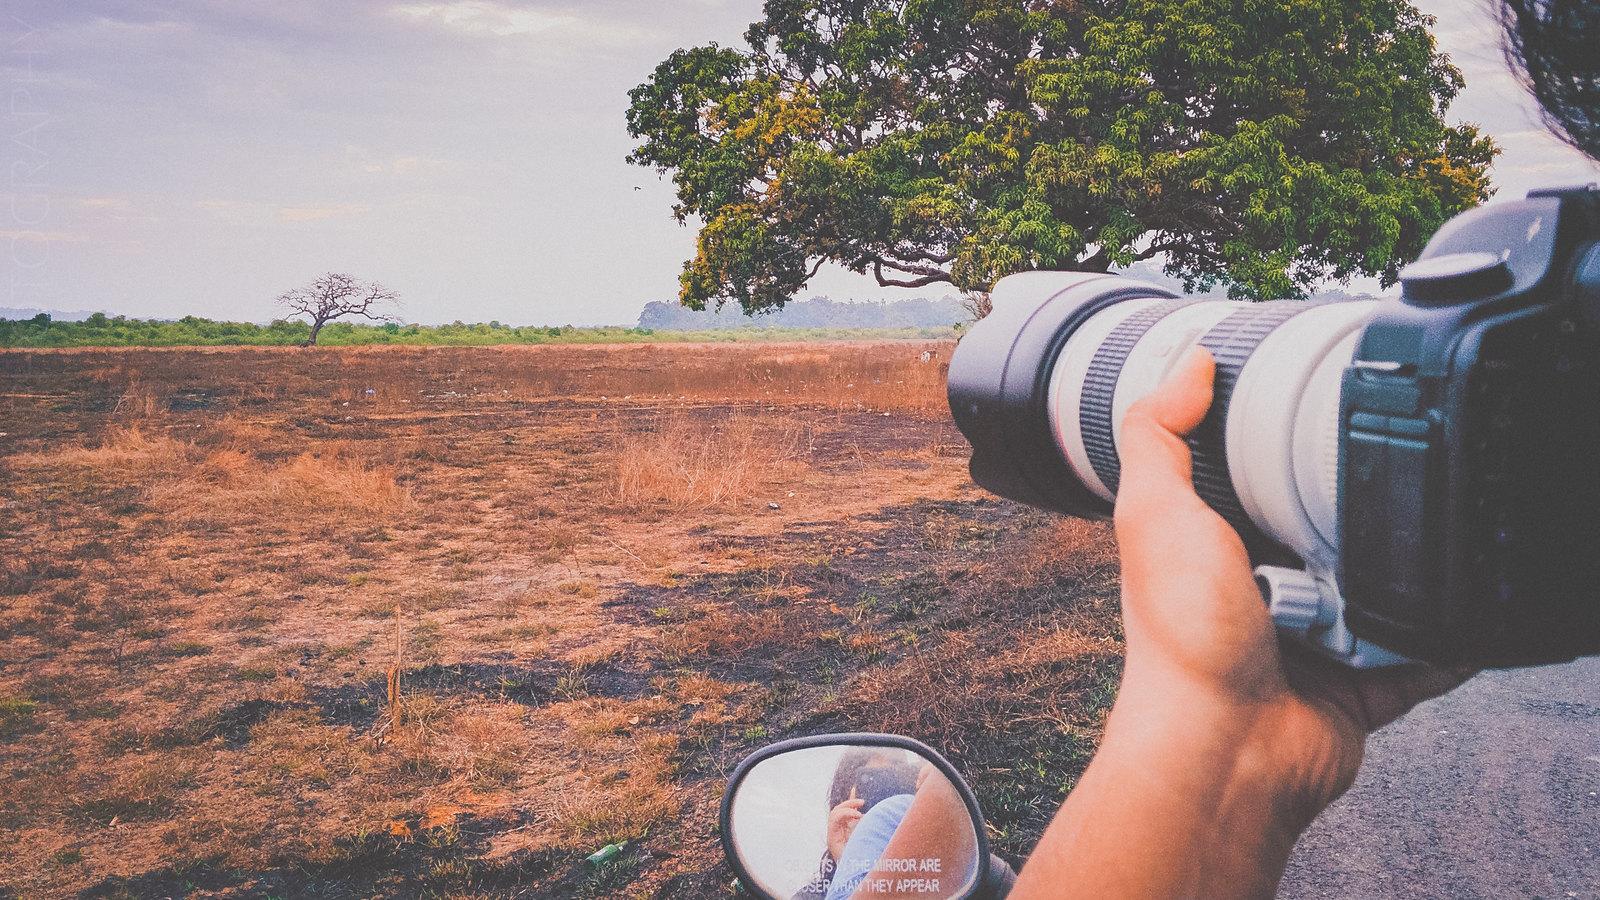 Photographing Divar